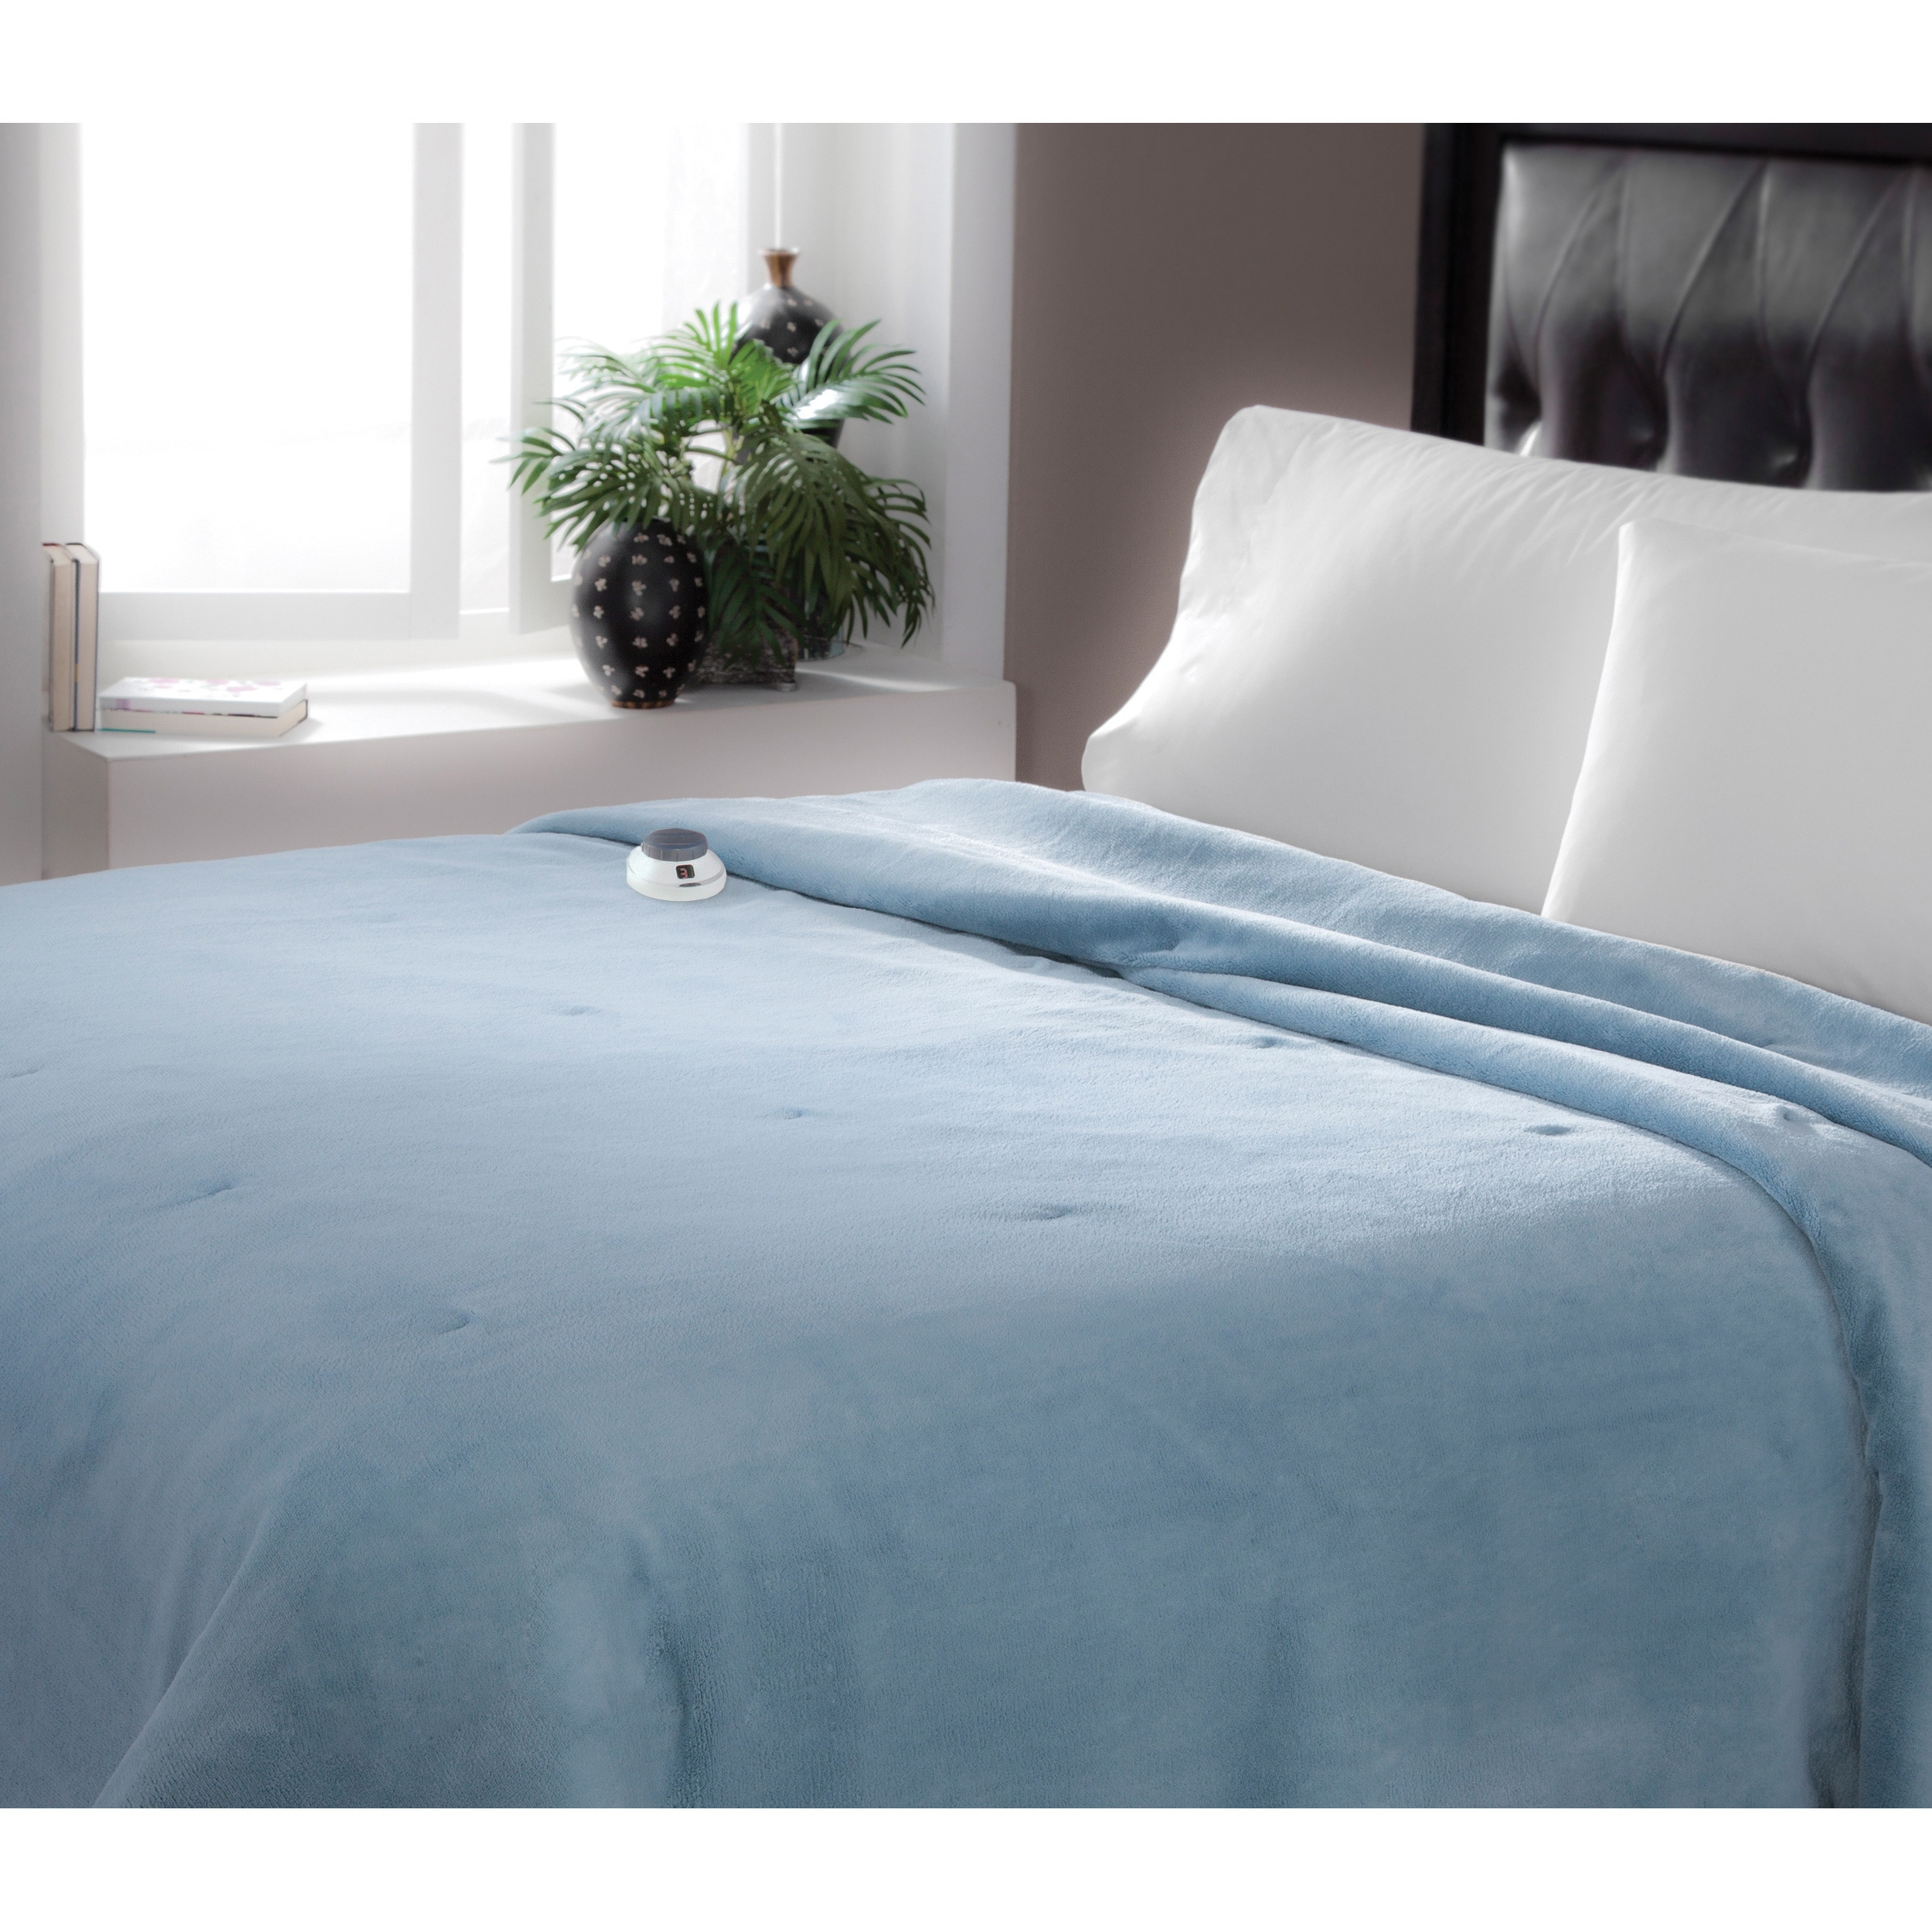 Serta Brand Soft Luxe Plush Electric Warming Blanket (Twi...